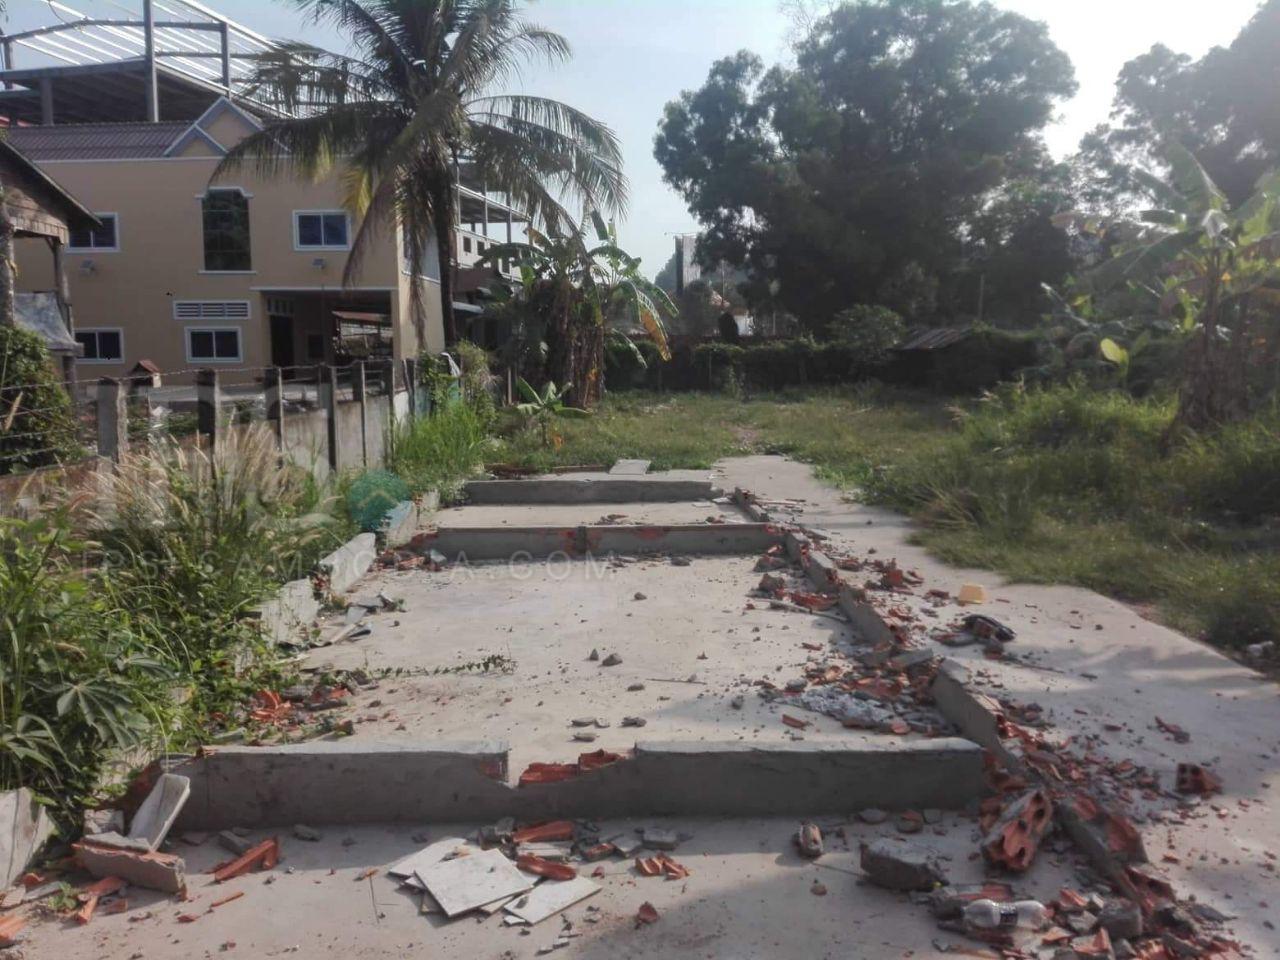 564 sq.m. Land For Sale - Mittapheap, Sihanouk Ville